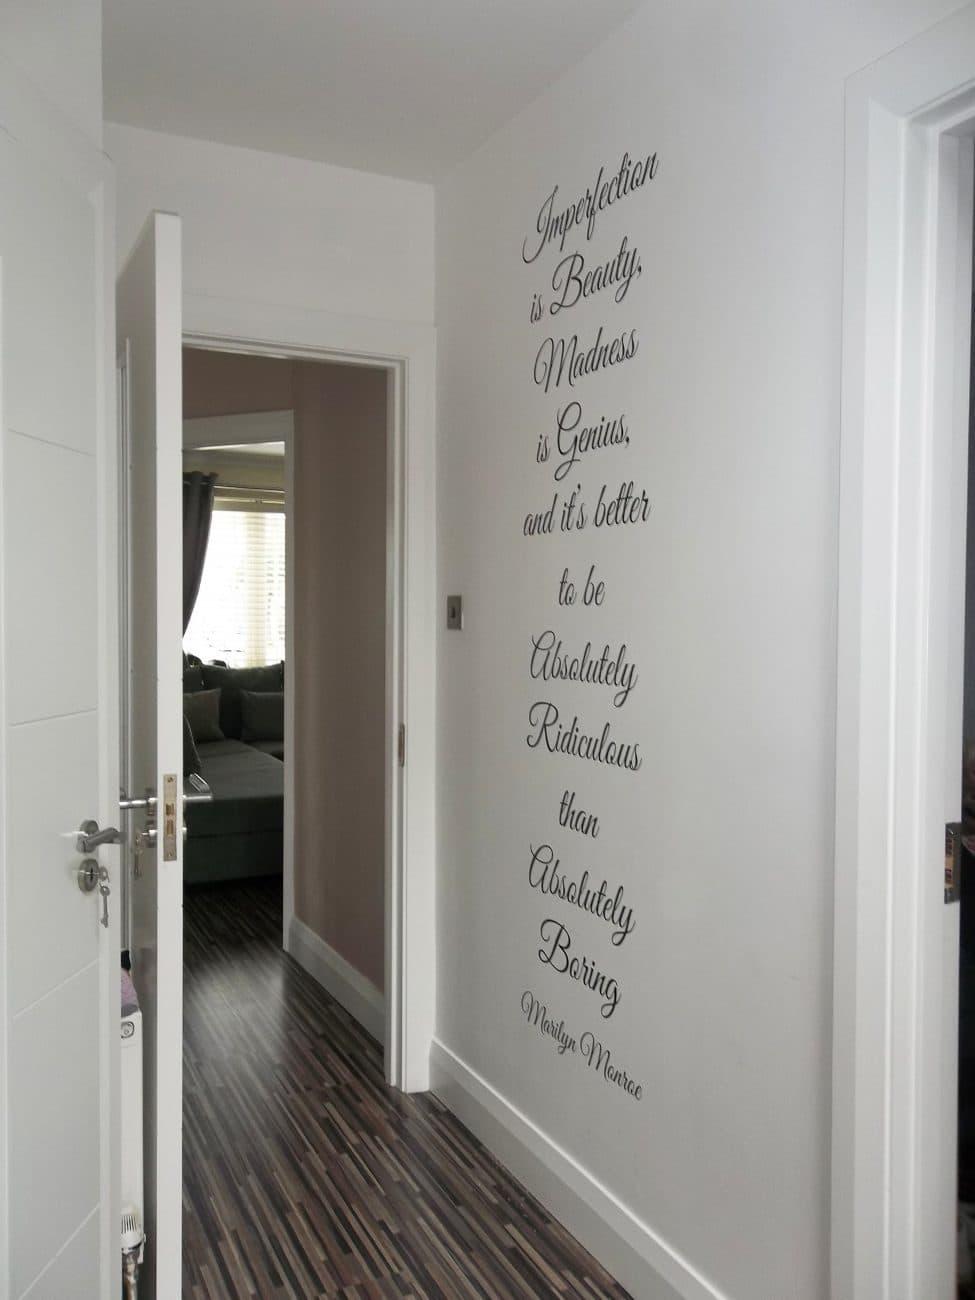 Marilyn Monroe Imperfection wall decal | Marilyn Monroe Imperfection | wall decalarilyn Monroe – Imperfection – wall art decal